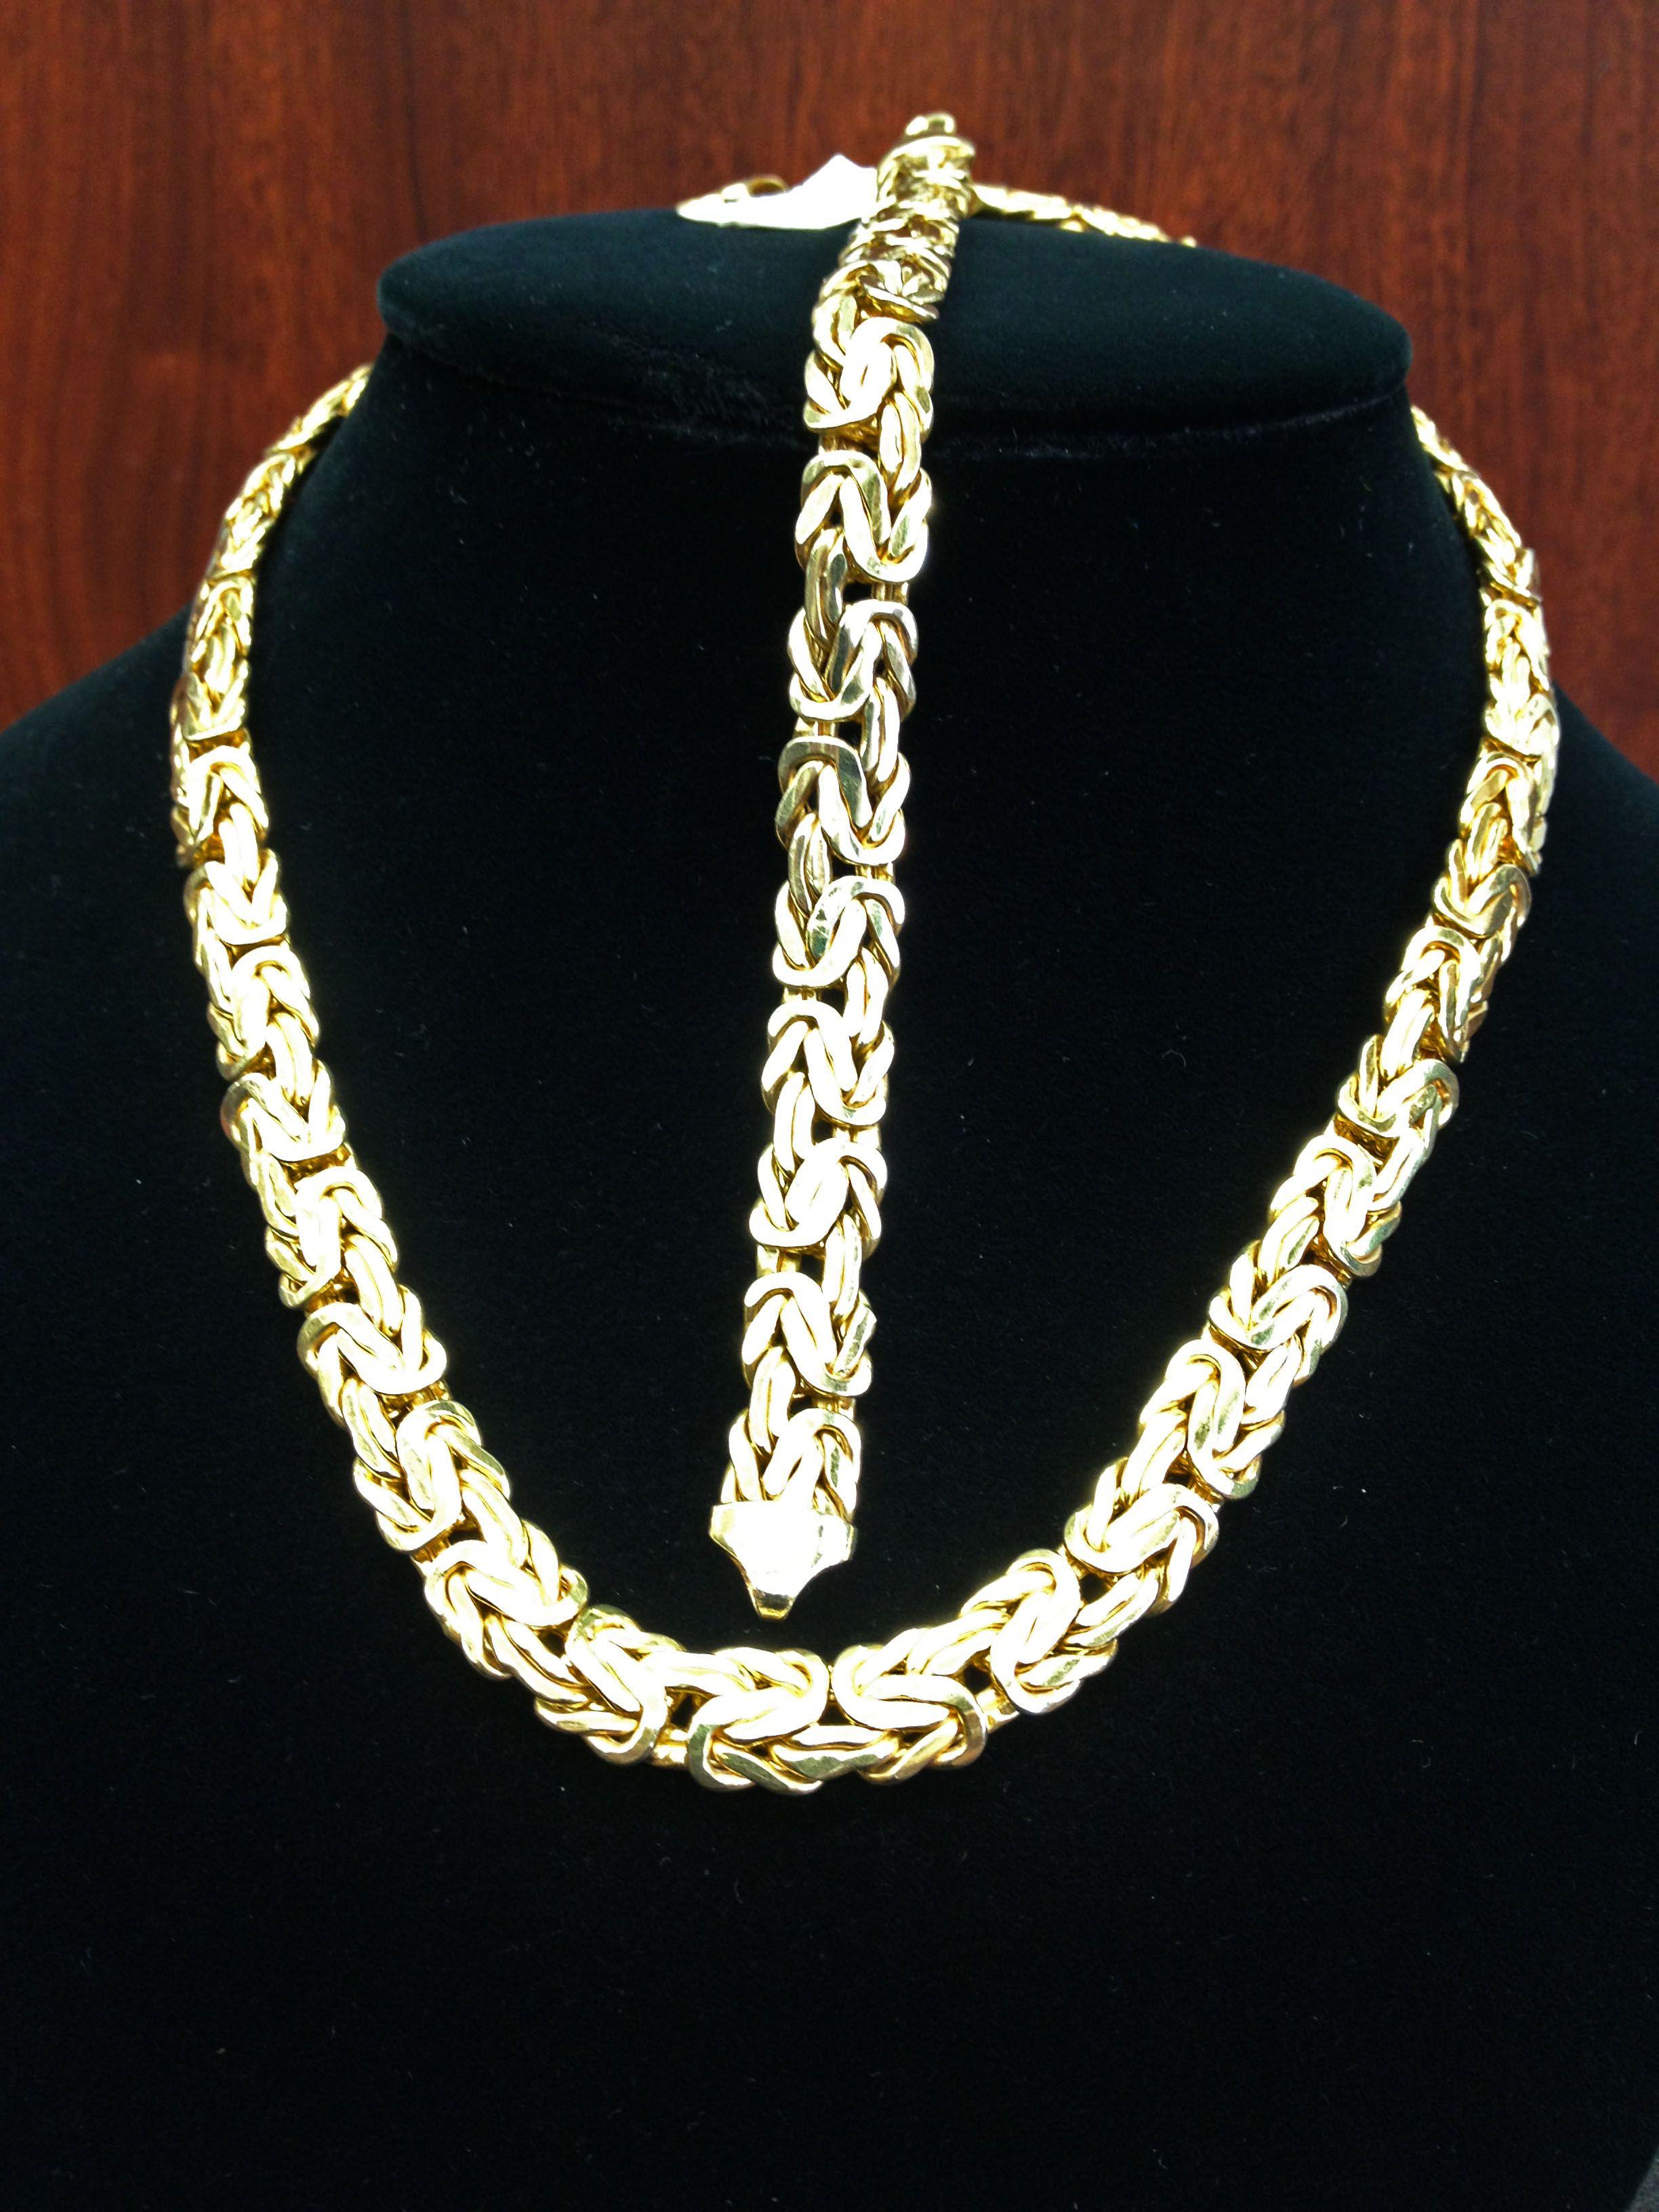 04c60fcfa1906 Solid 14k yellow gold Byzantine necklace and bracelet set available ...